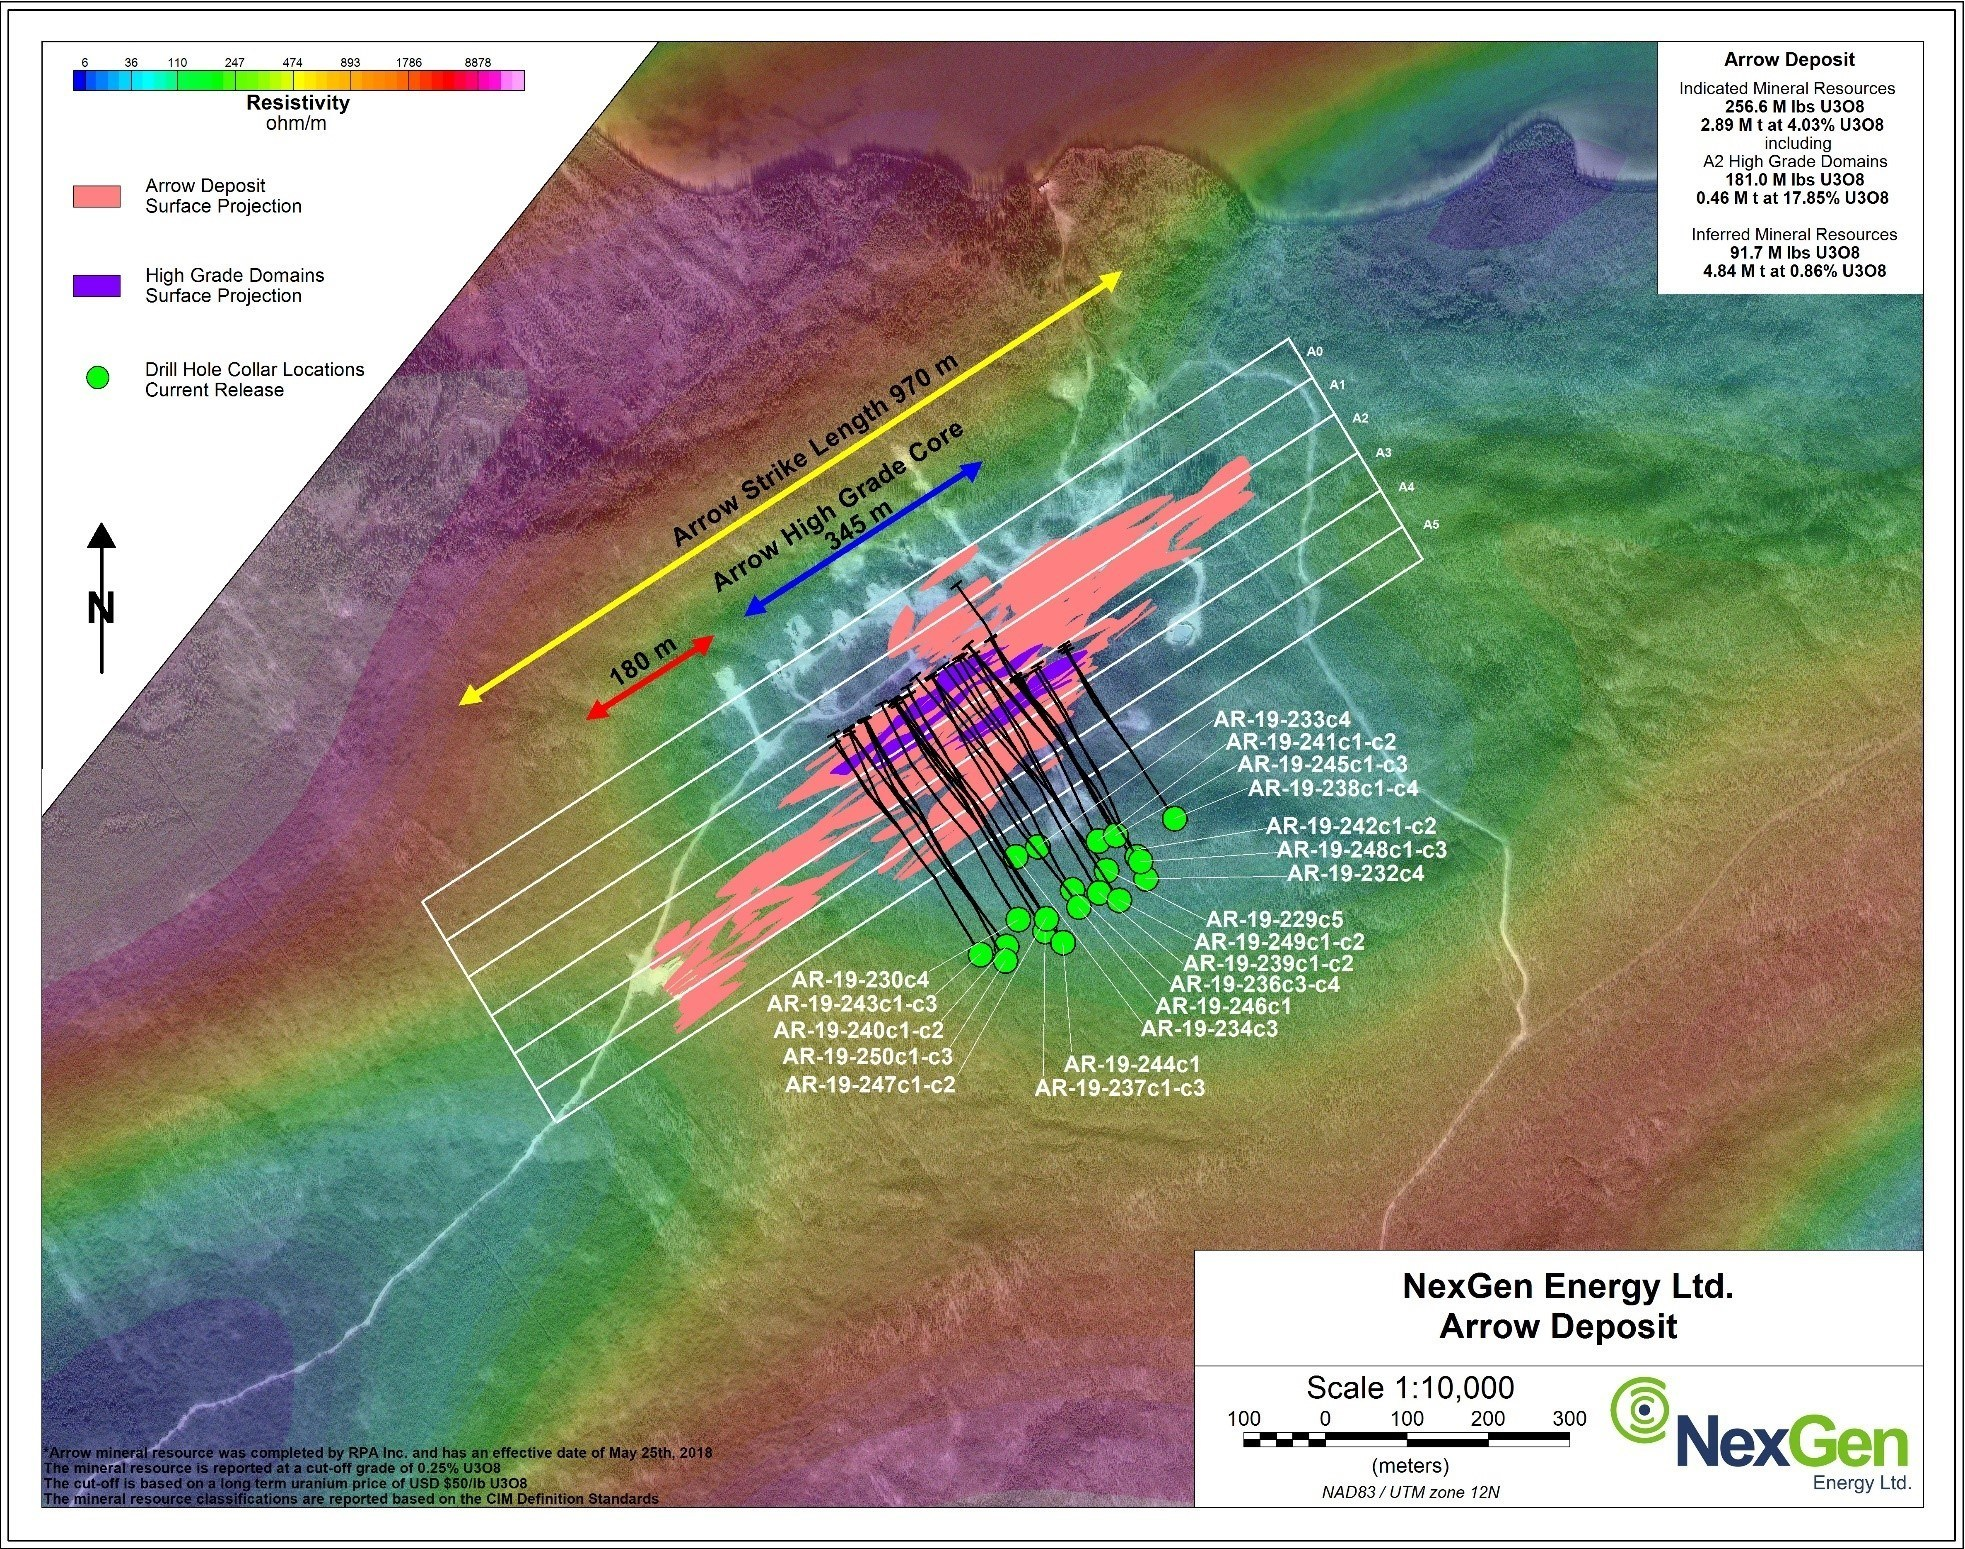 Figure 3: Arrow Deposit Drill Hole Locations (CNW Group/NexGen Energy Ltd.)